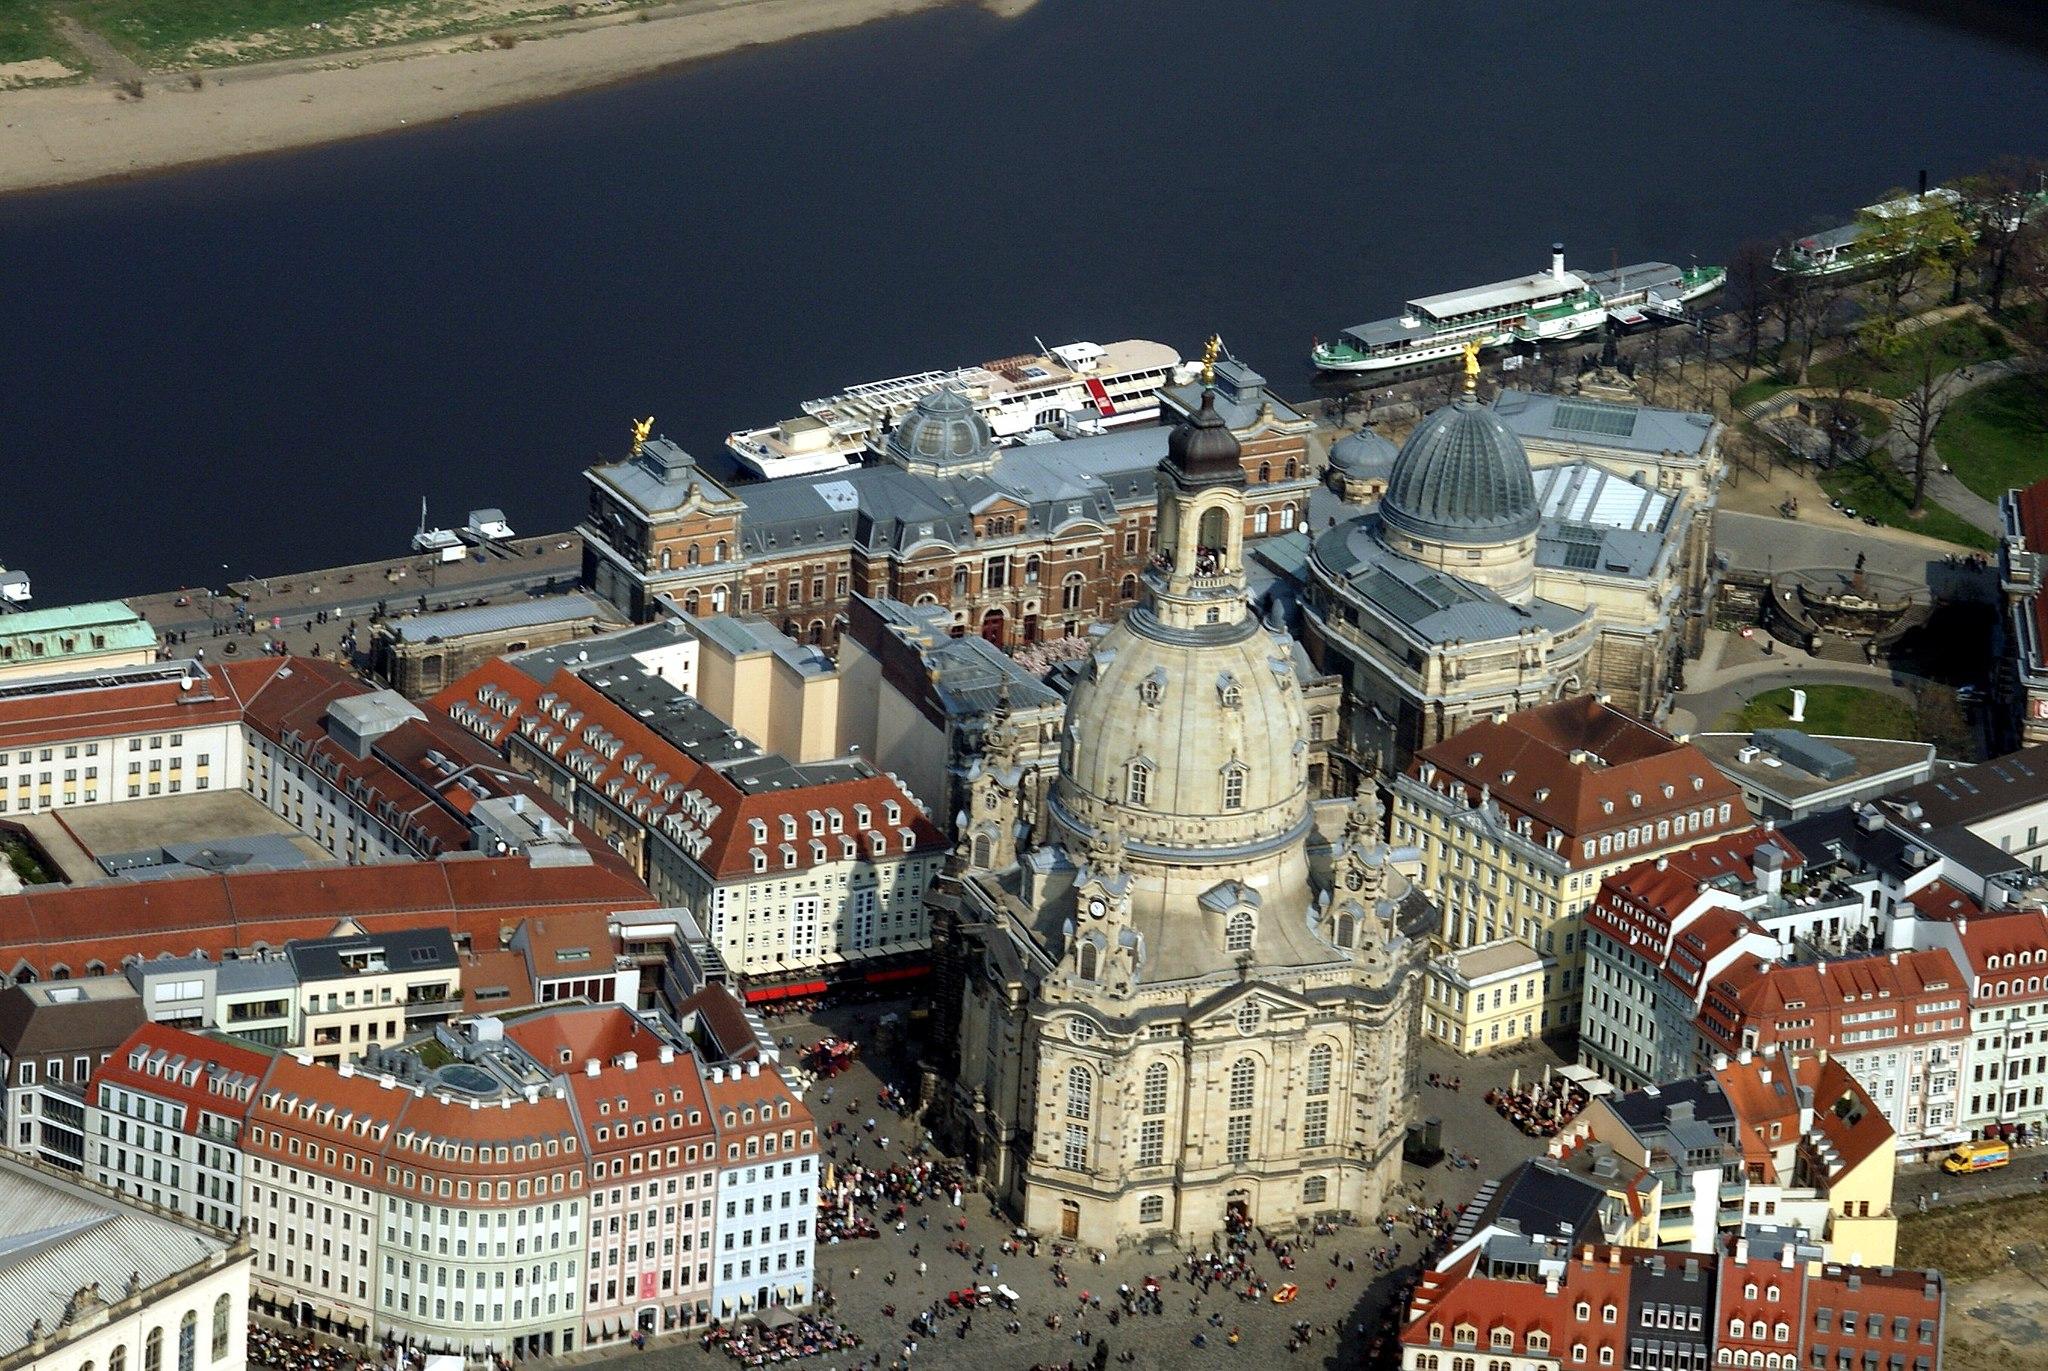 Luftbild Frauenkirche Dresden 2014-03-29 - 2